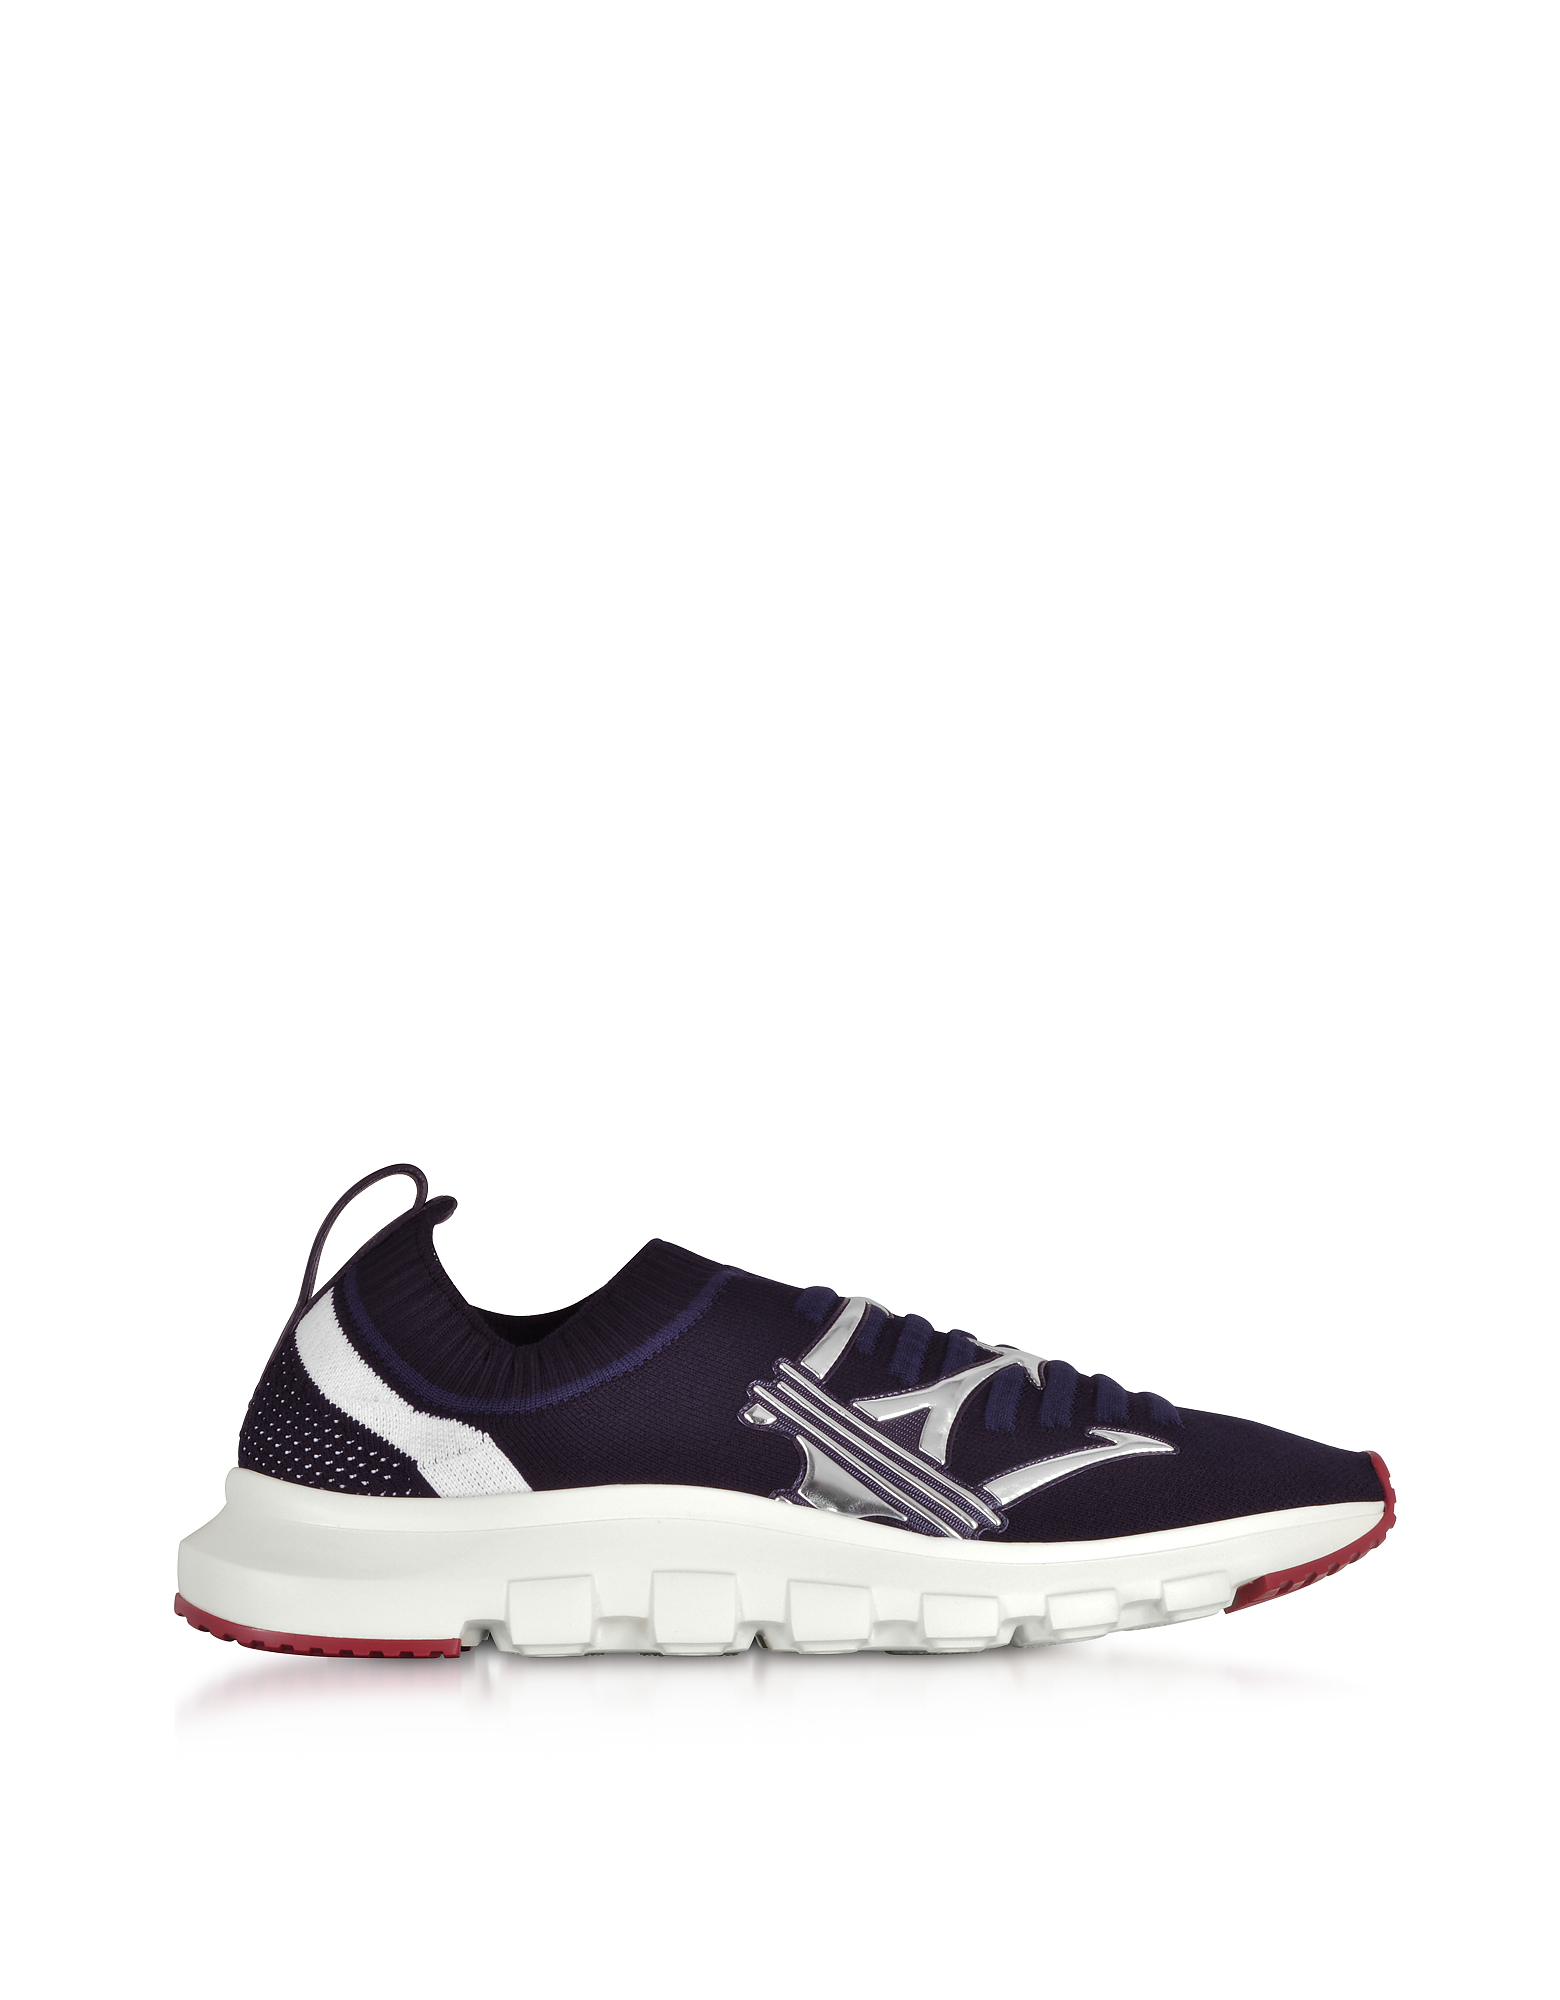 fccdb49890 Ermenegildo Zegna Navy Blue Techmerino Men's Sneakers   ModeSens